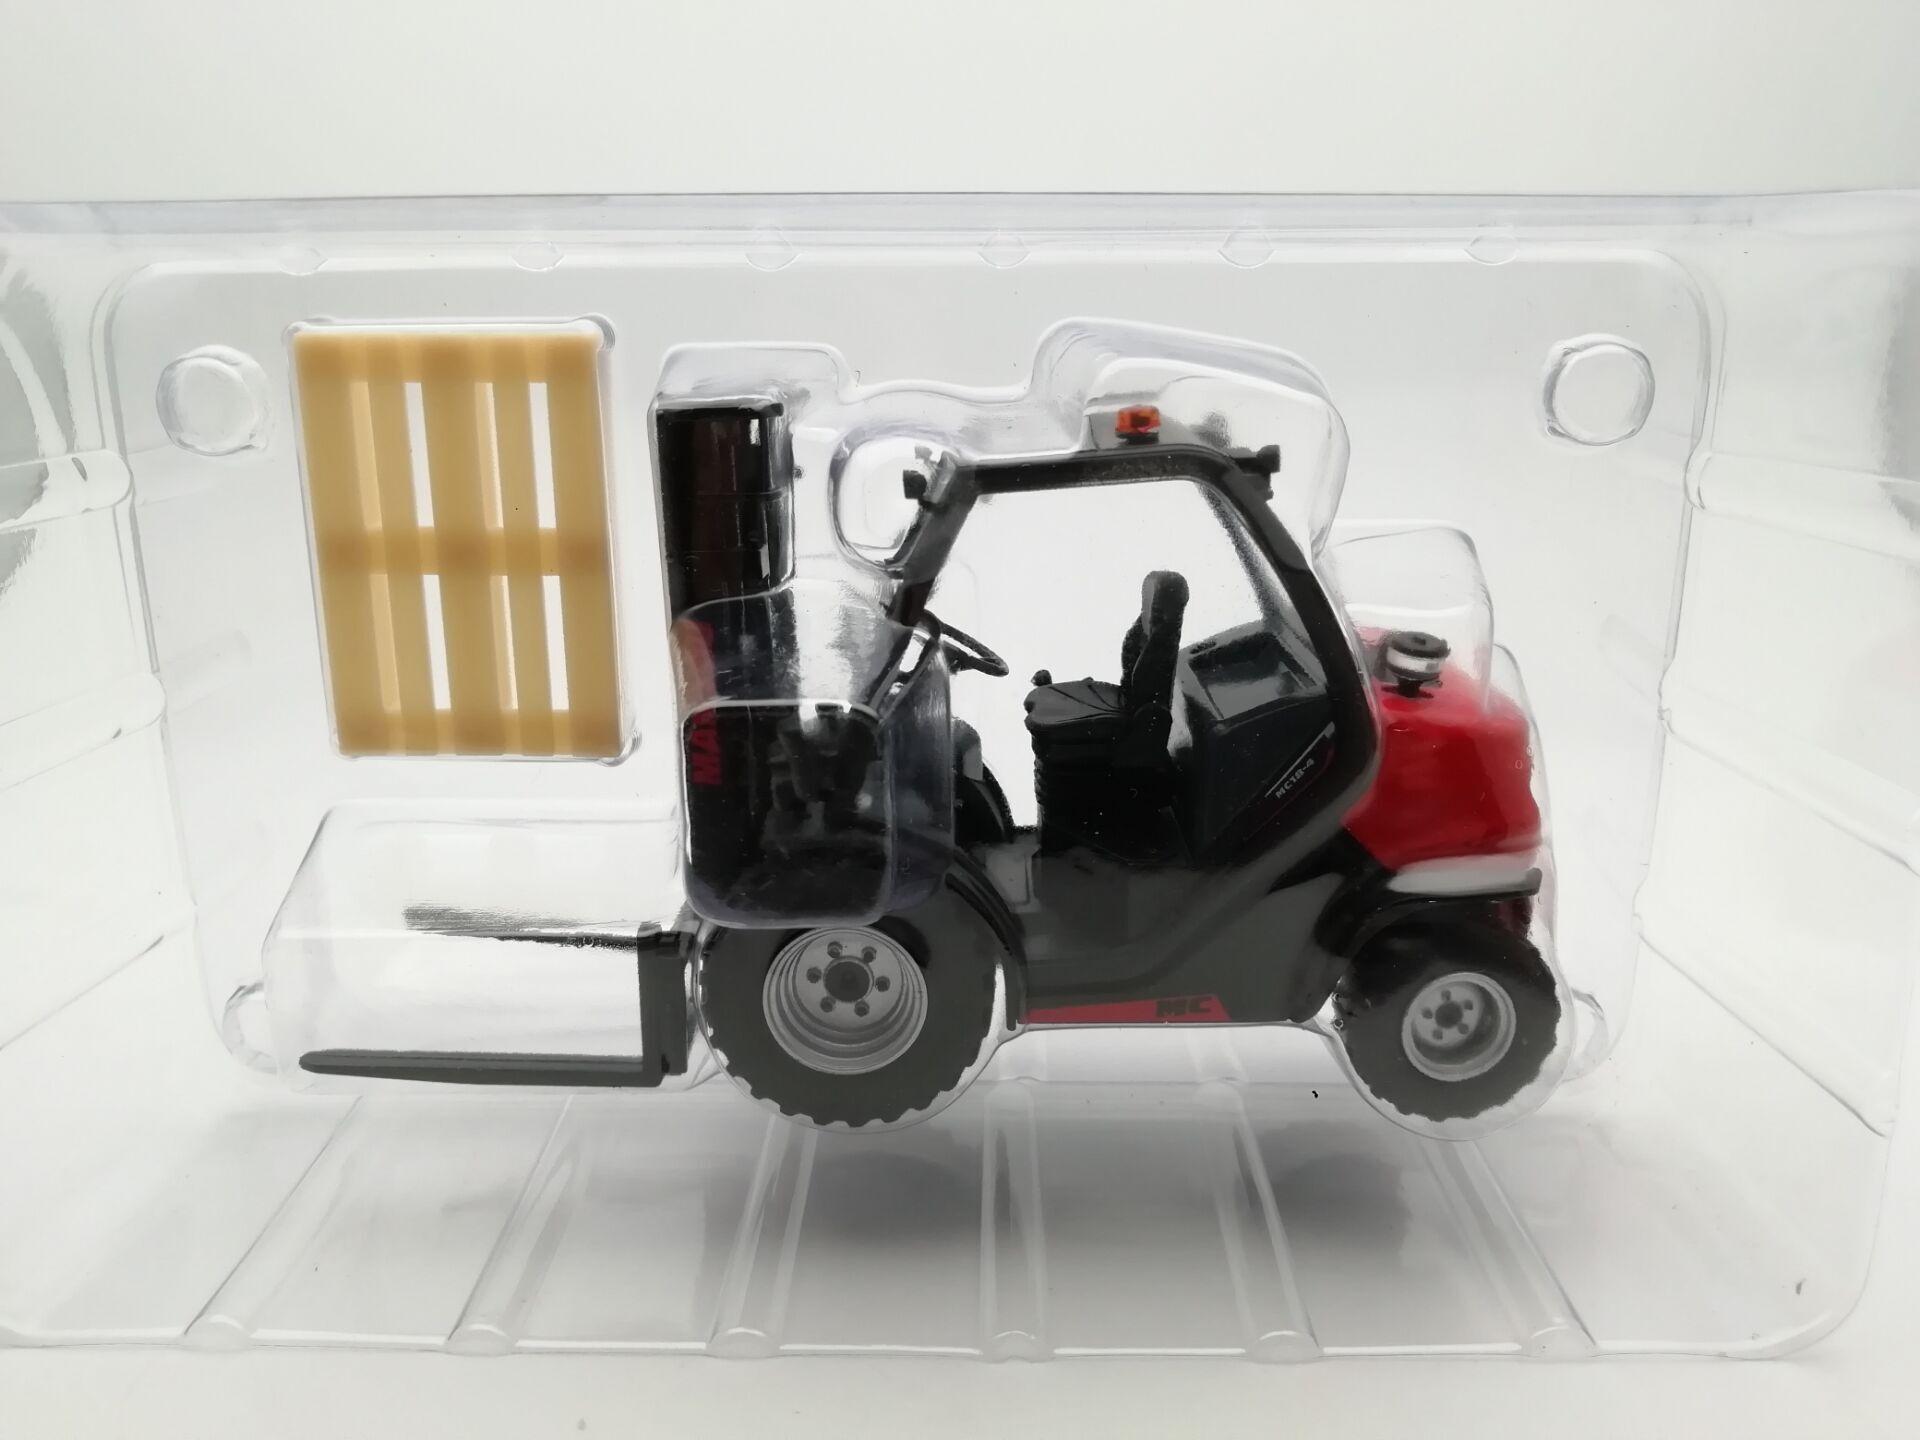 Landini 4.105 Trattore Tractor 1:32 Model 4944 UNIVERSAL HOBBIES